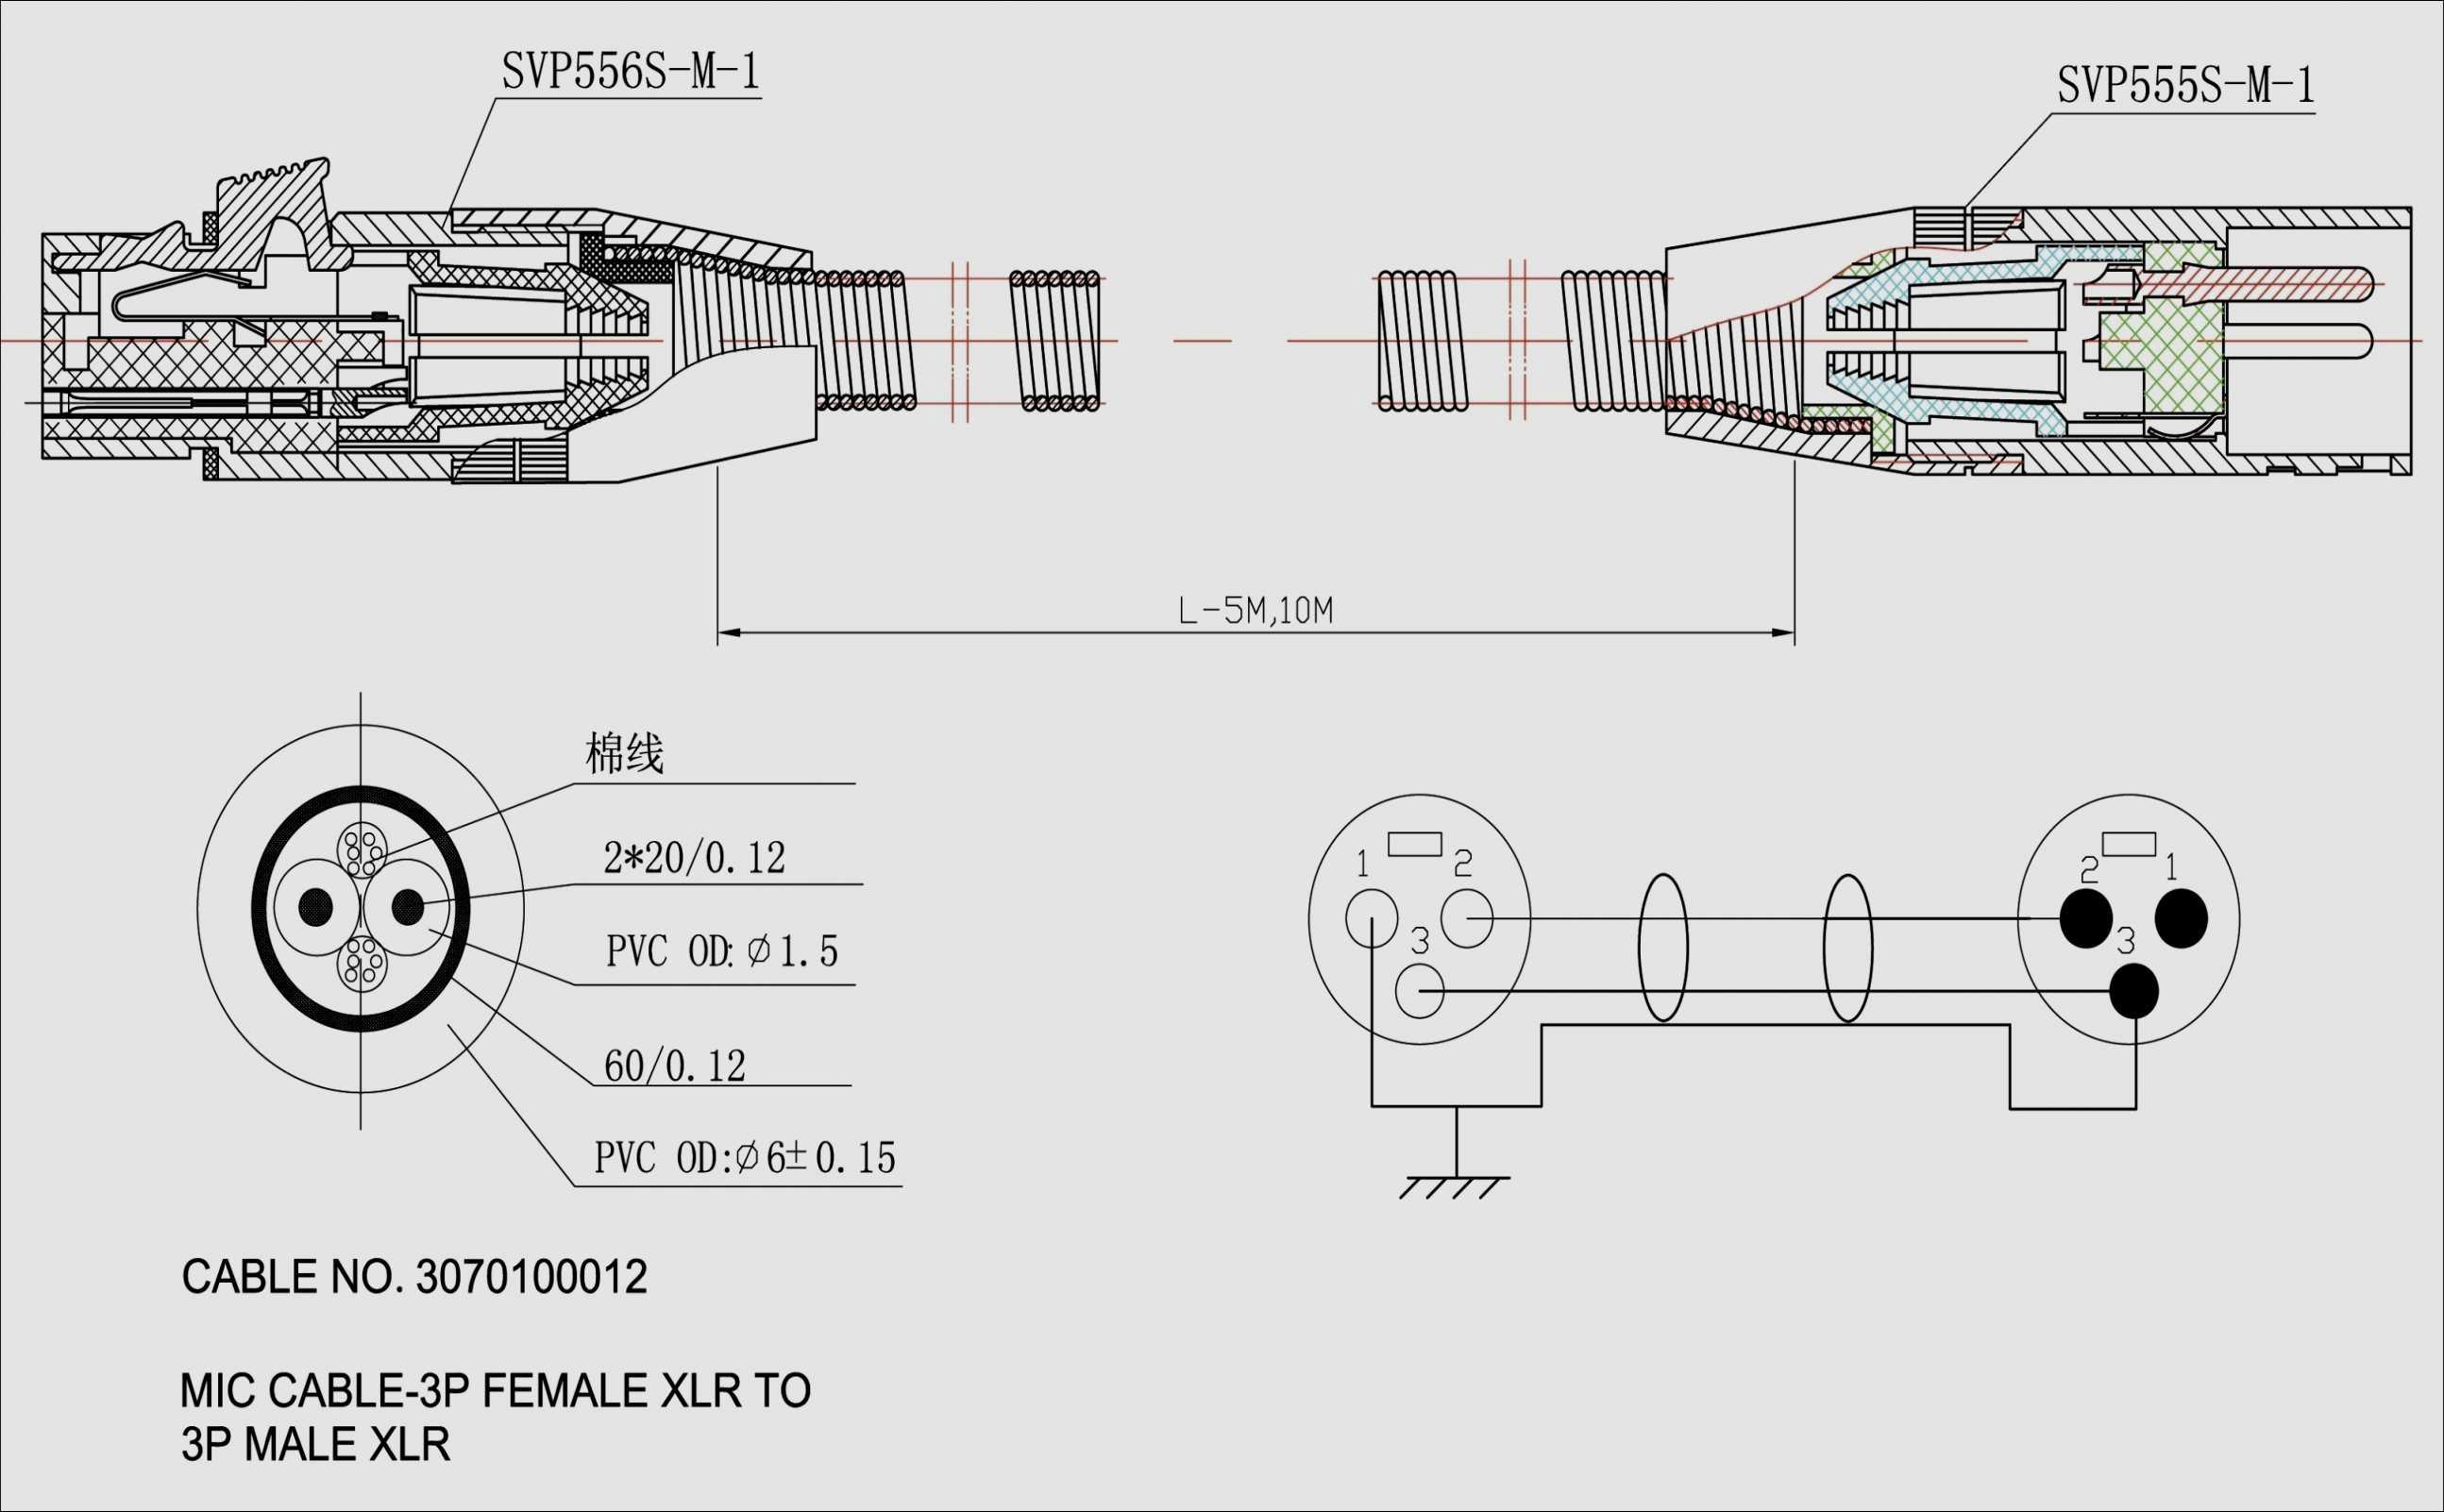 95 dodge ram 1500 wiring diagram ey 1572  2001 dodge ram radio wiring diagram view diagram 2001  2001 dodge ram radio wiring diagram